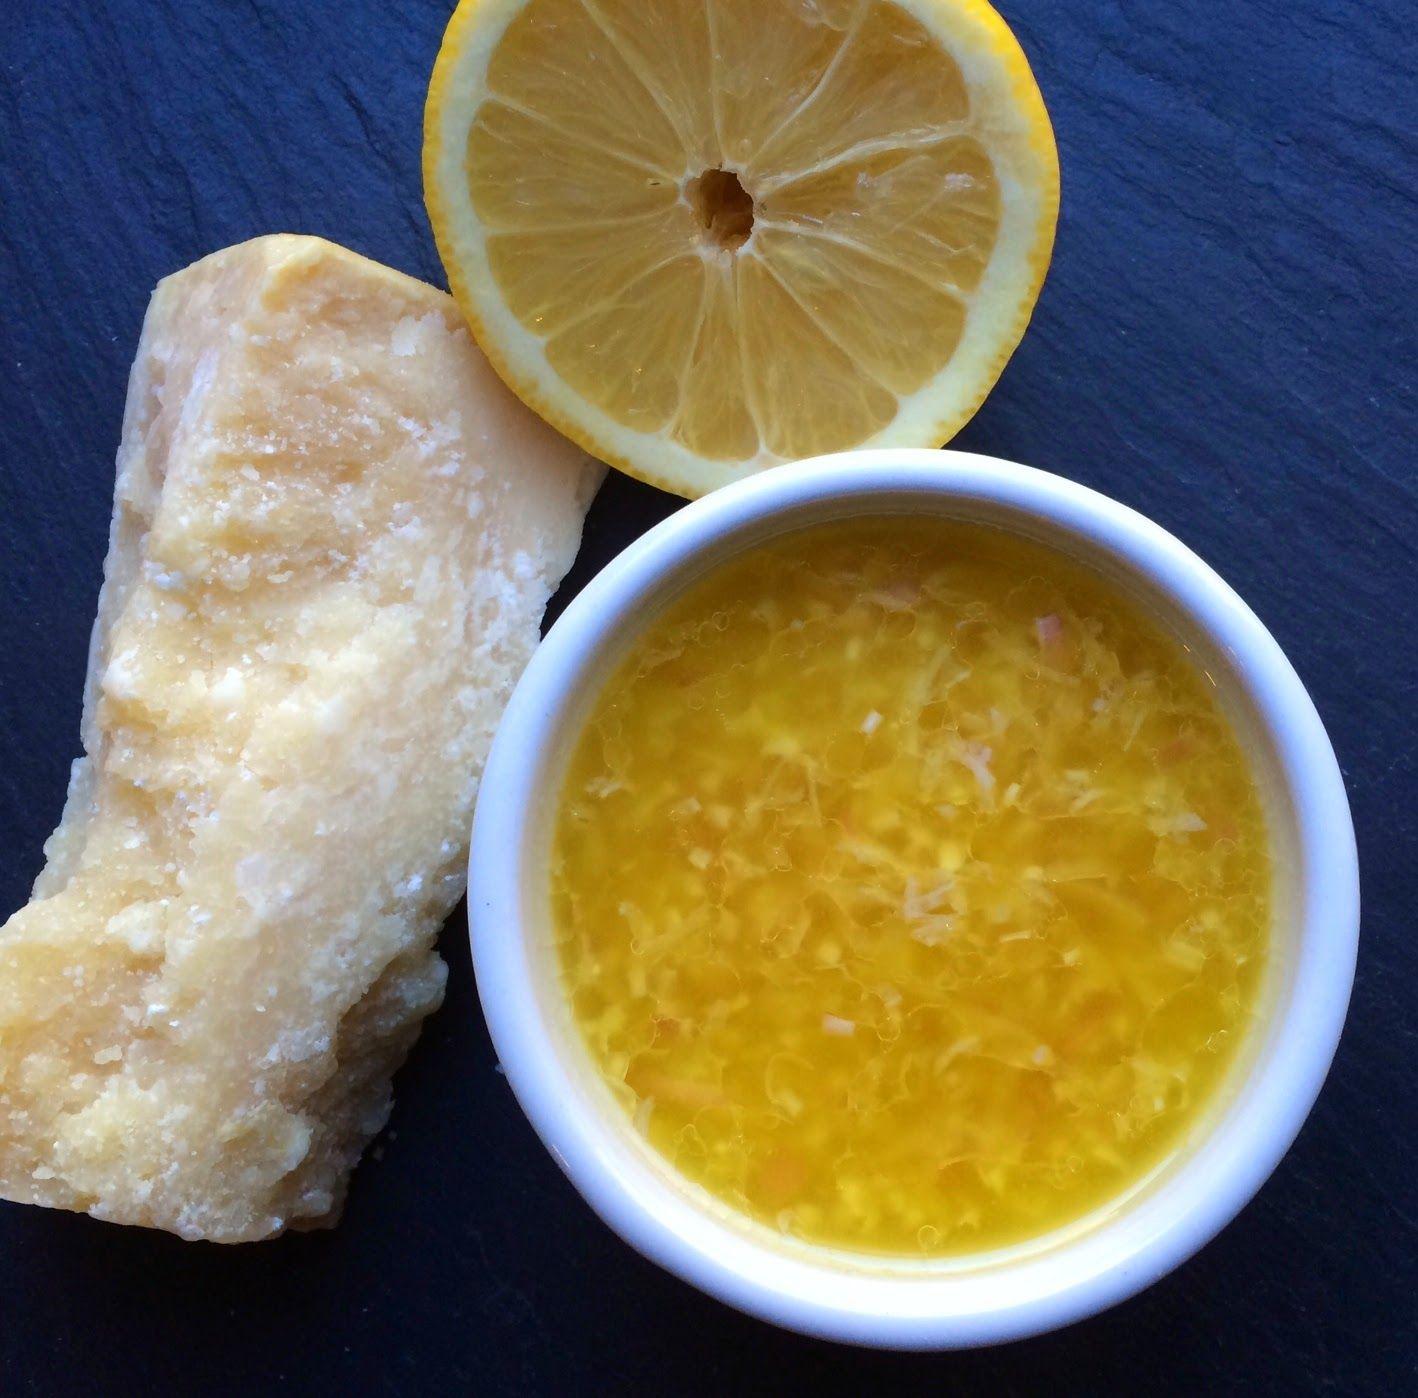 Clean Eating Lemon Parmesan Vinaigrette, homemade salad dressing: no added sugar, gluten-free